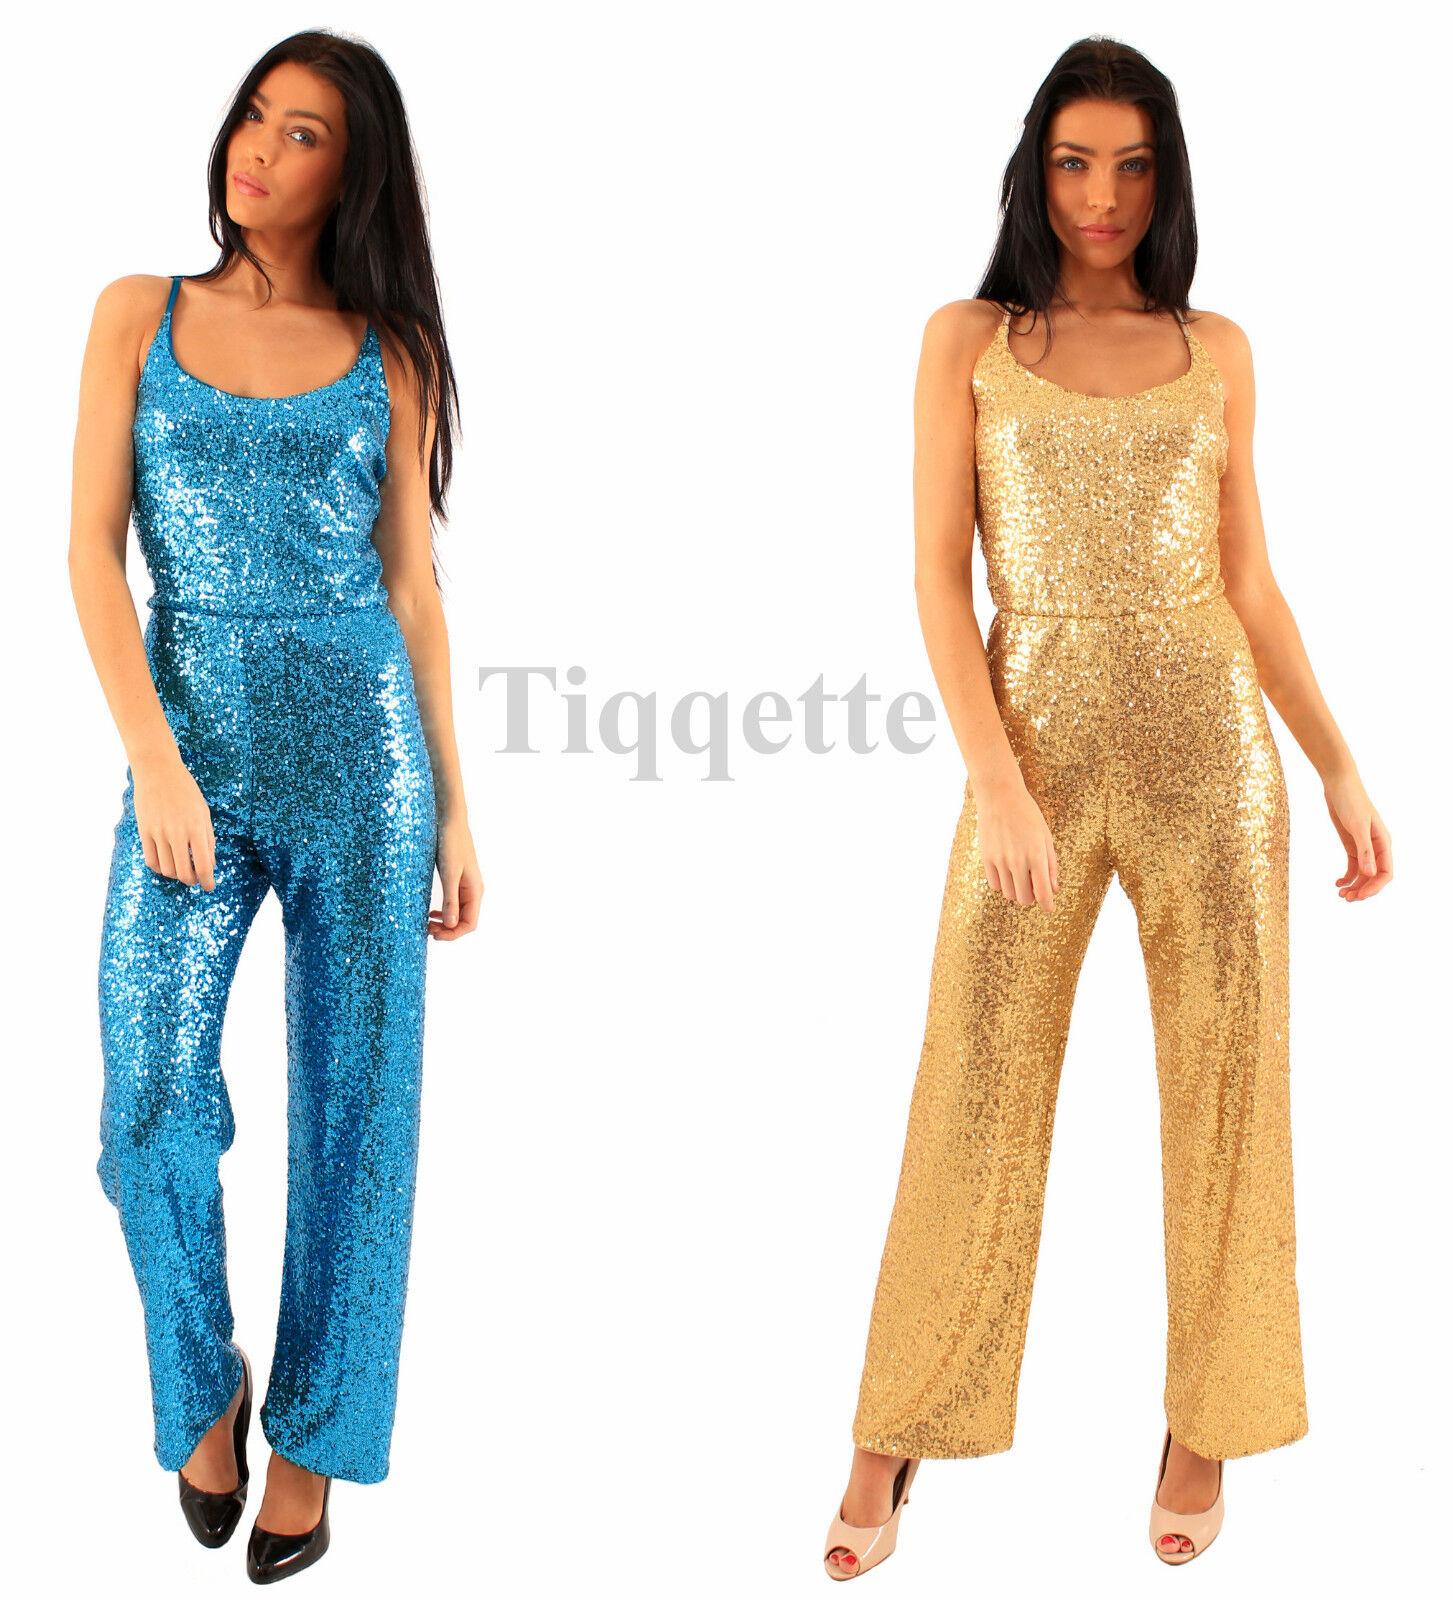 Sequin Jumpsuit in 2 Glorious Colours